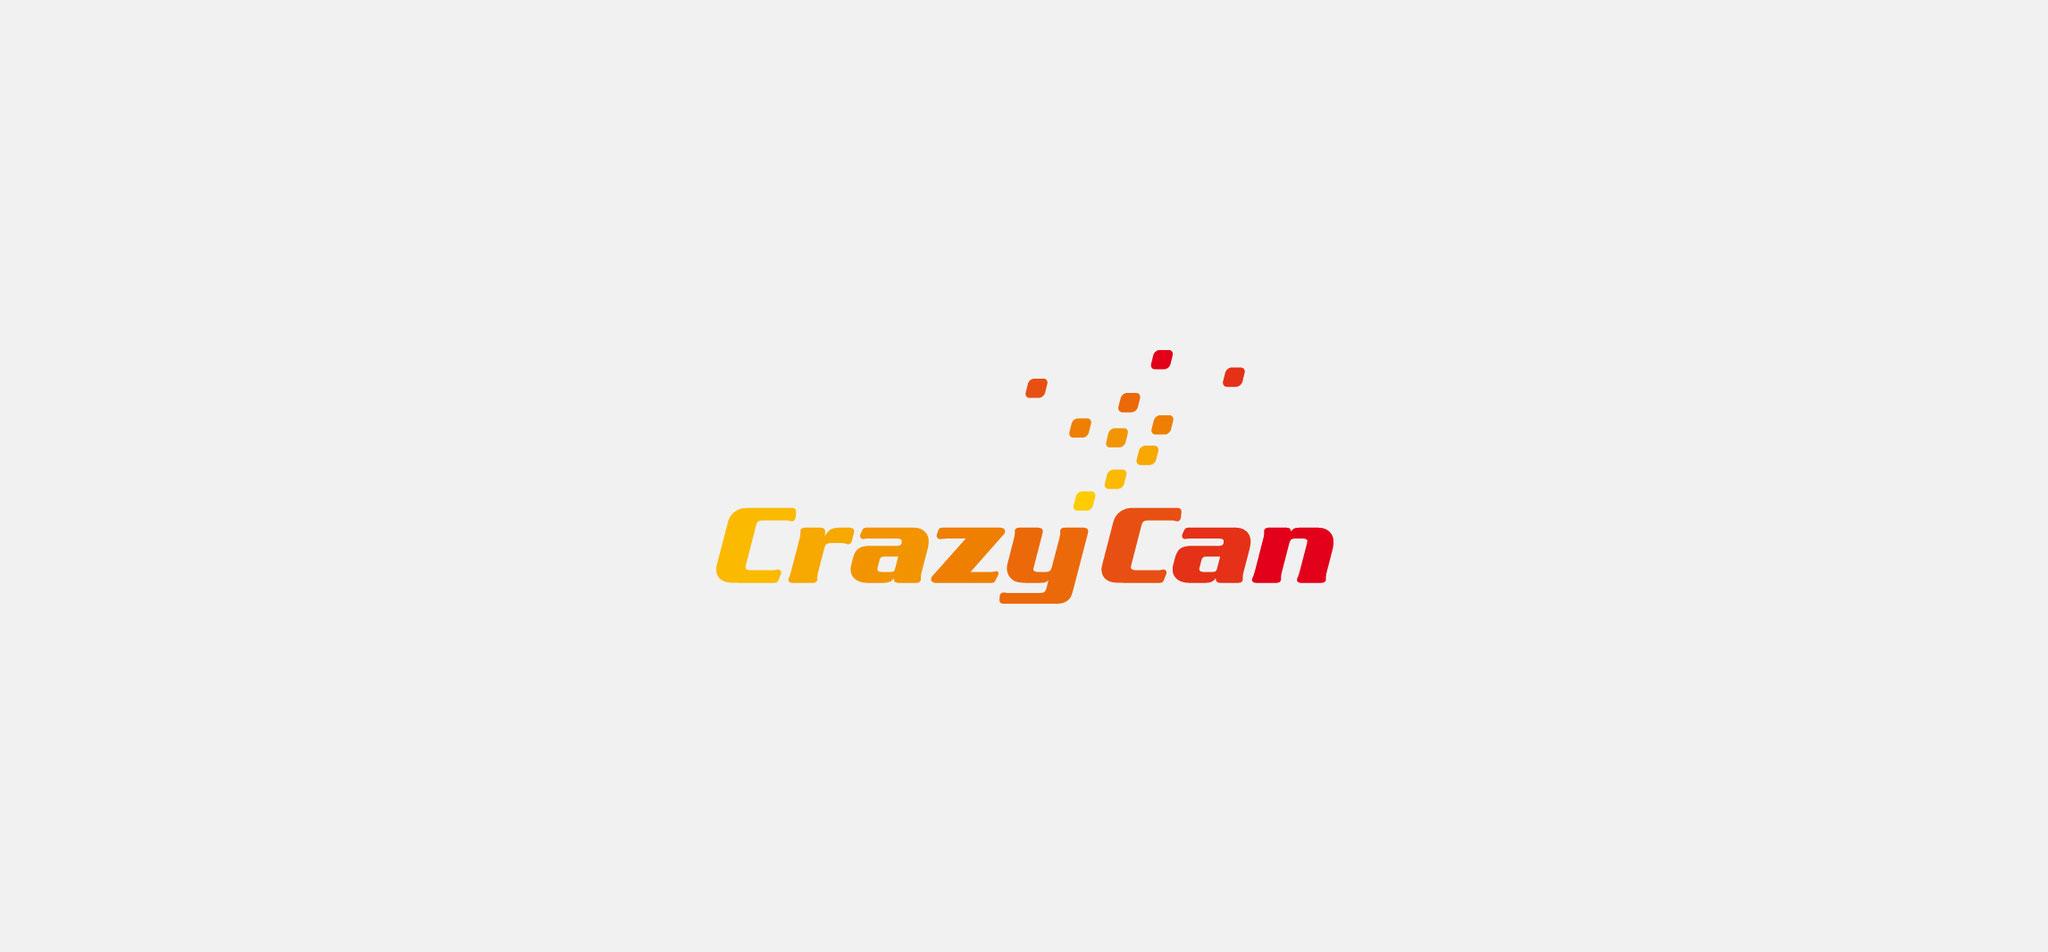 4PACK | logo crazy can – infragrau, gute gestaltung